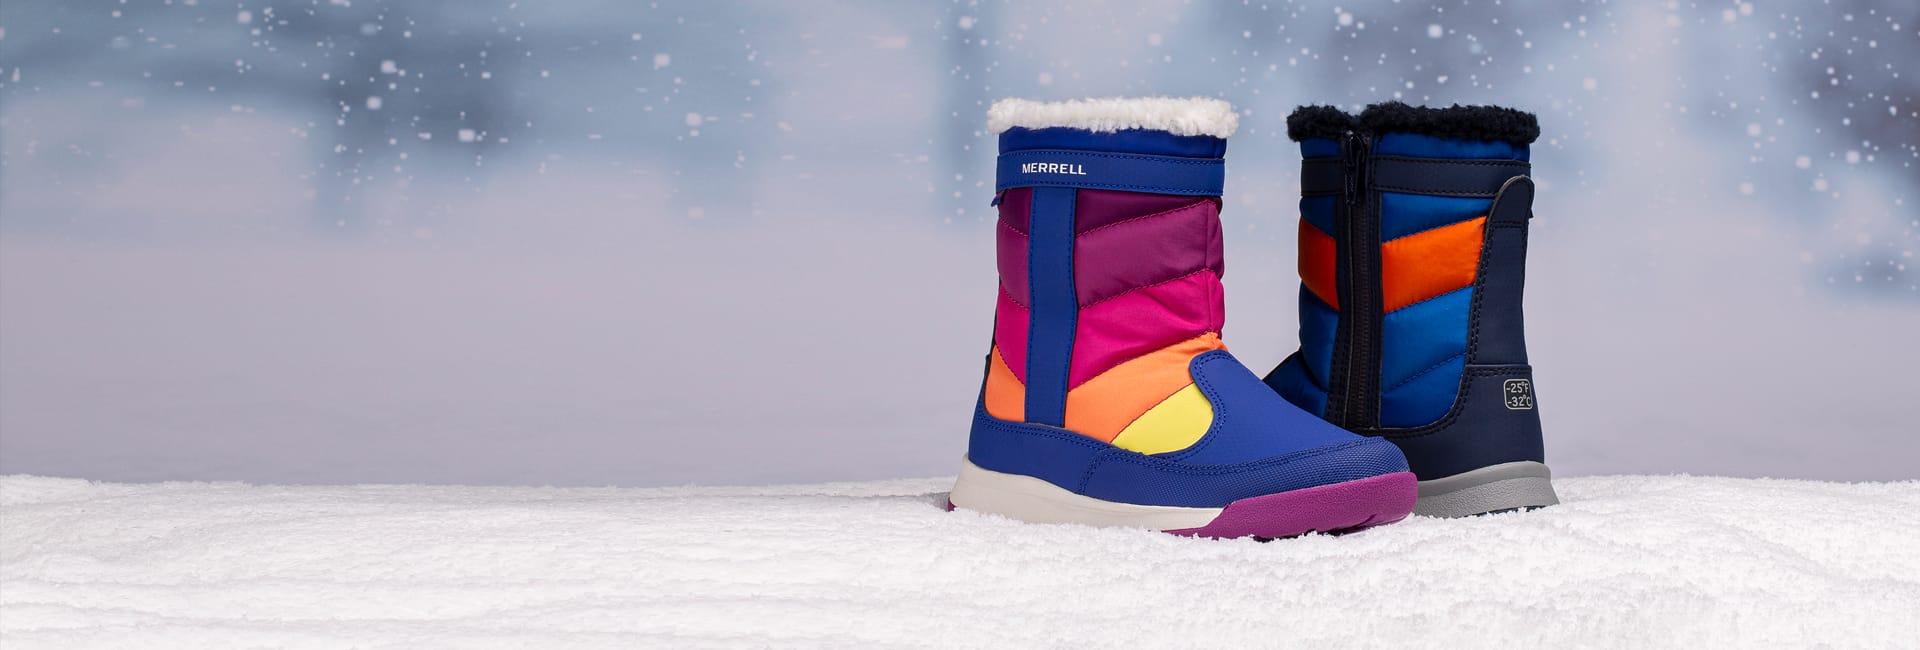 Merrell | Alpine Puffer Waterproof